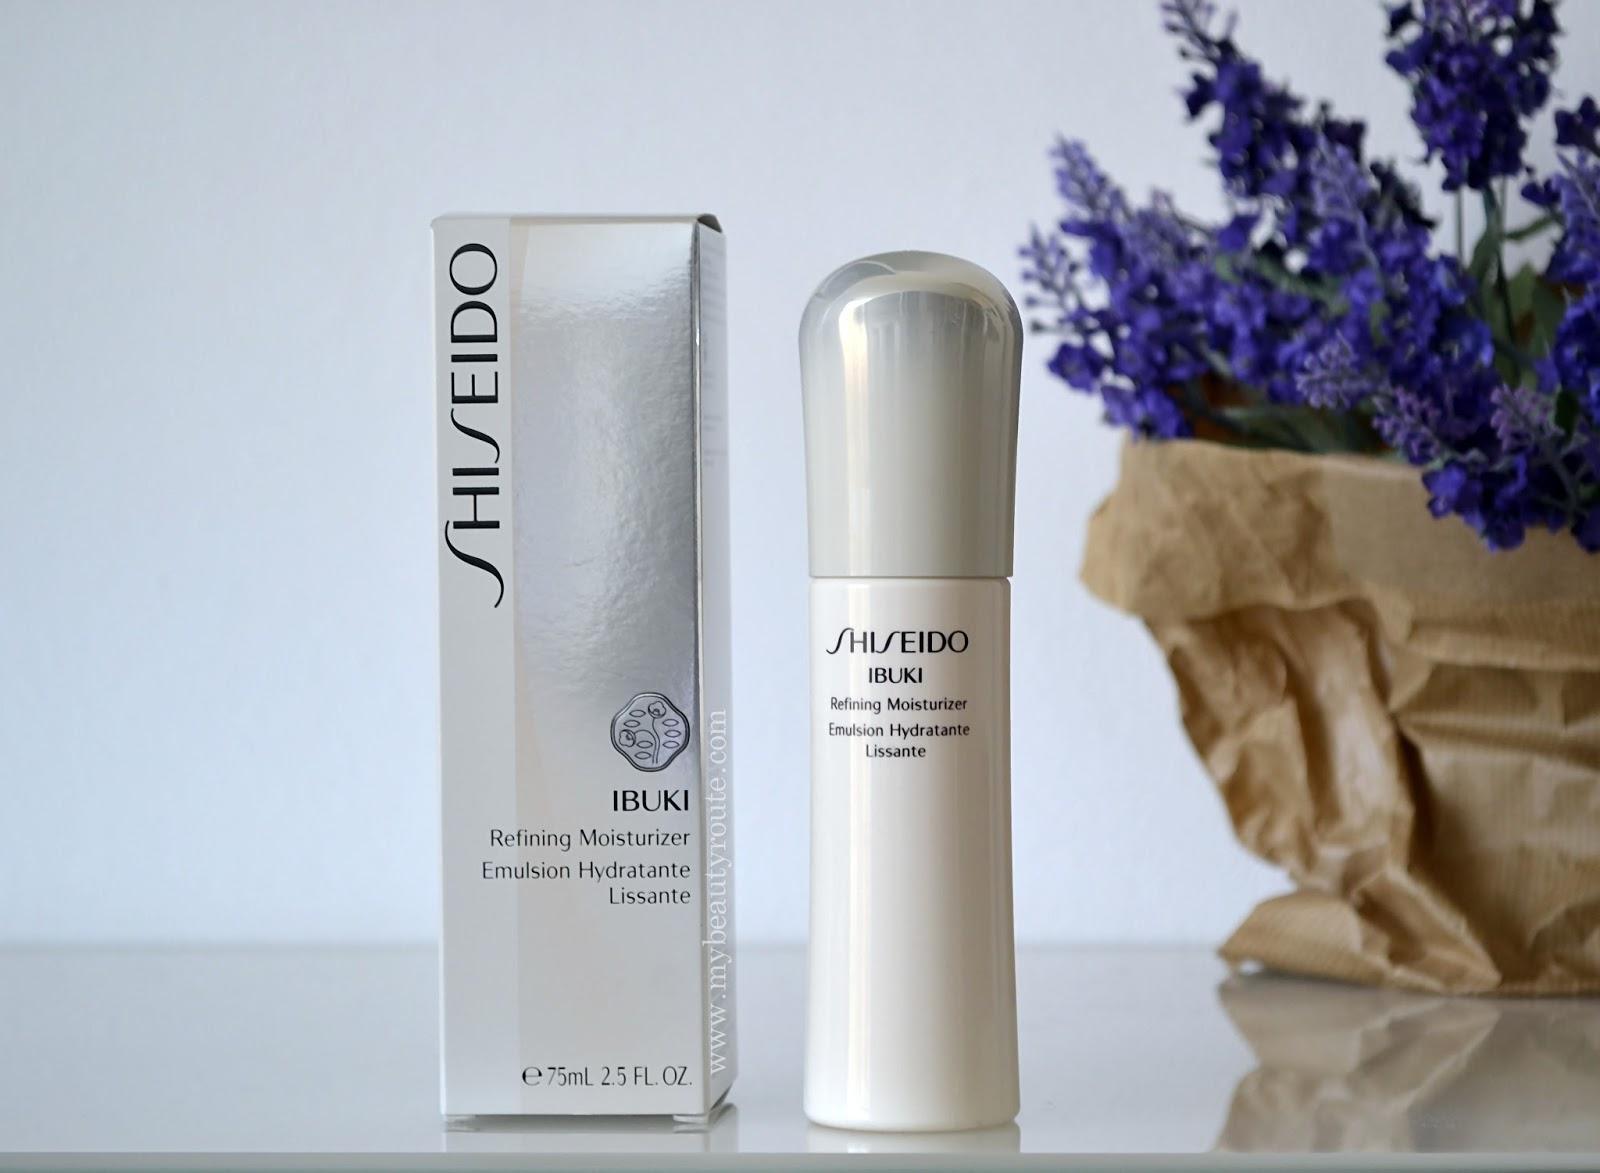 Reseña review crema hidratante Ibuki de Shiseido